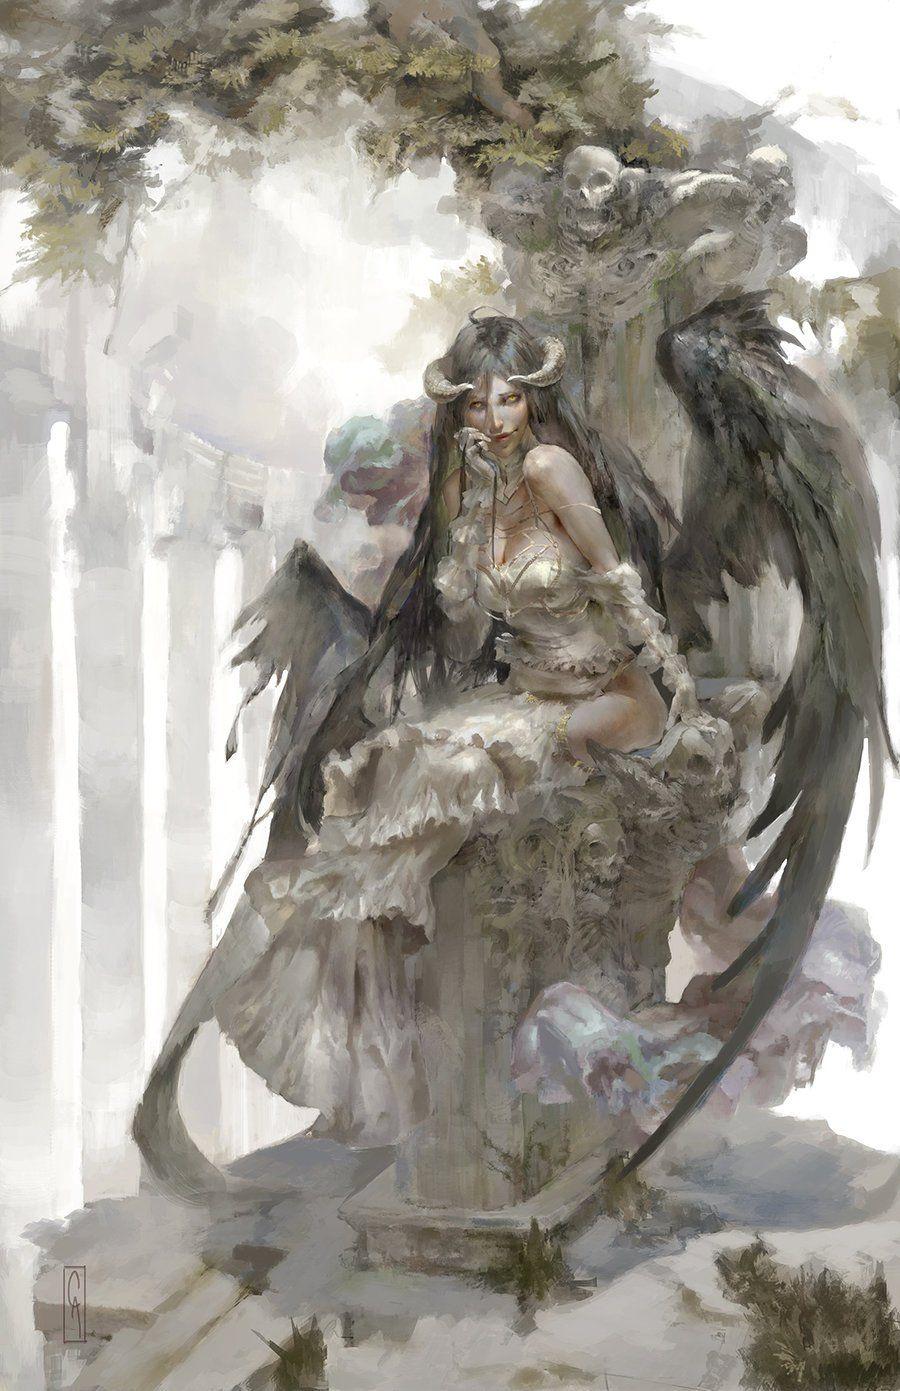 Dessin Ange Realiste by christian angel   dessin, painting et dessin manga